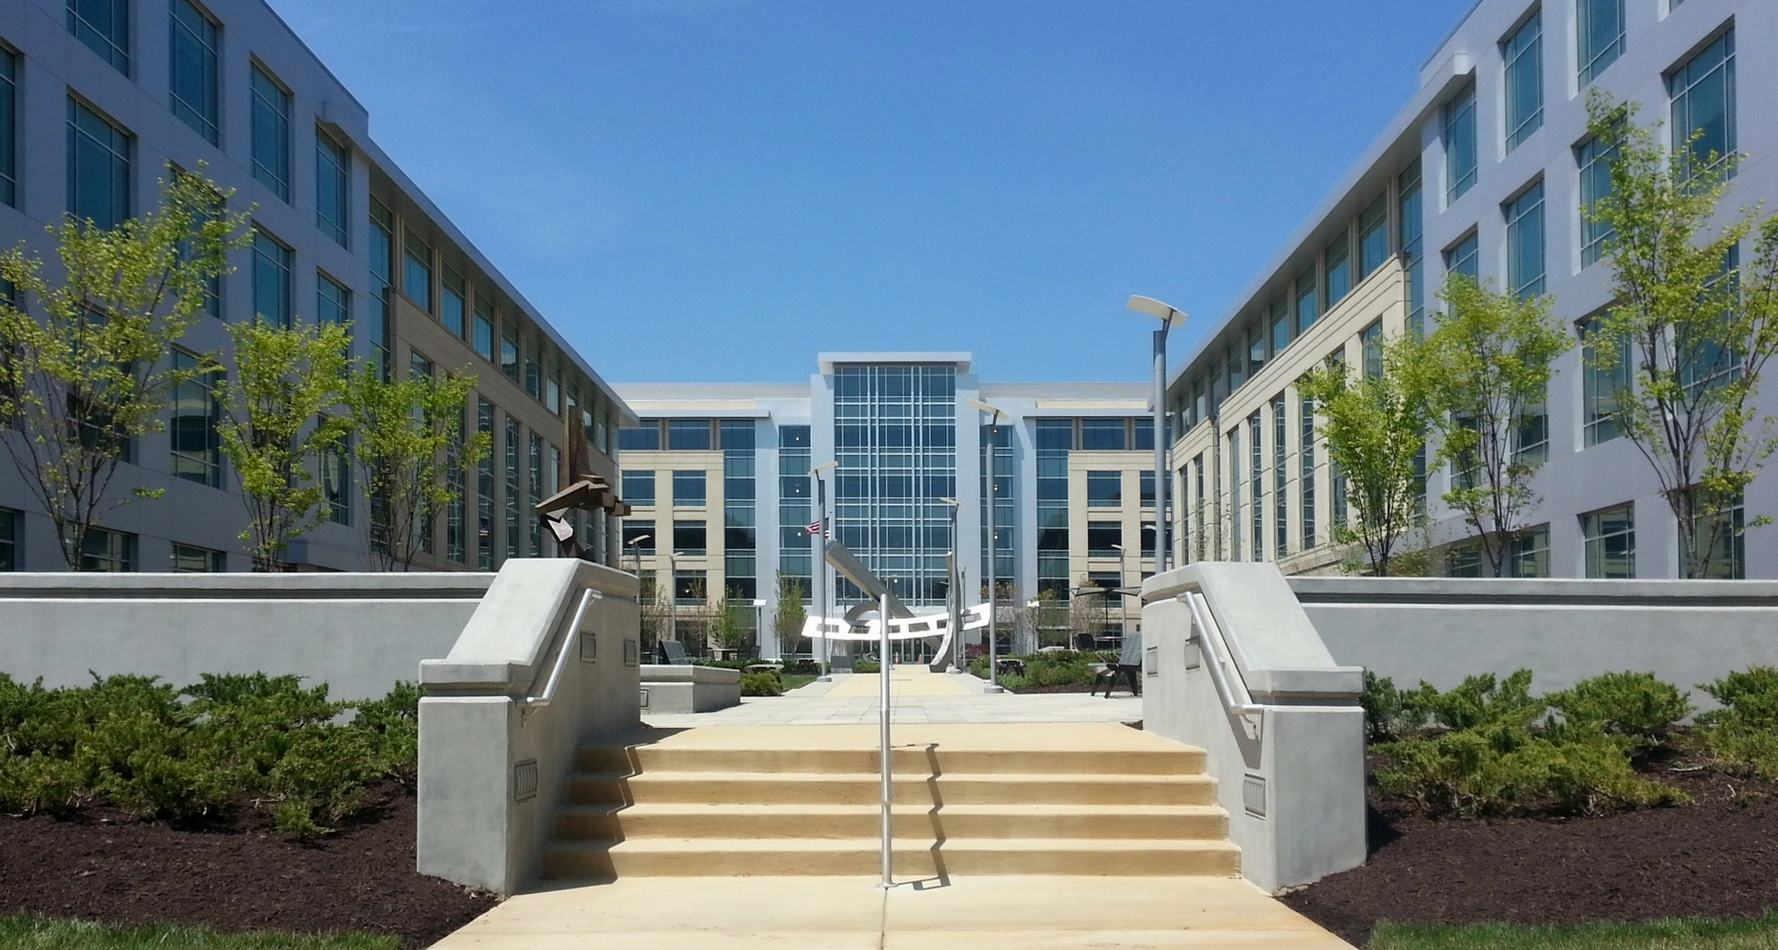 410-430 National Business Parkway - Exterior